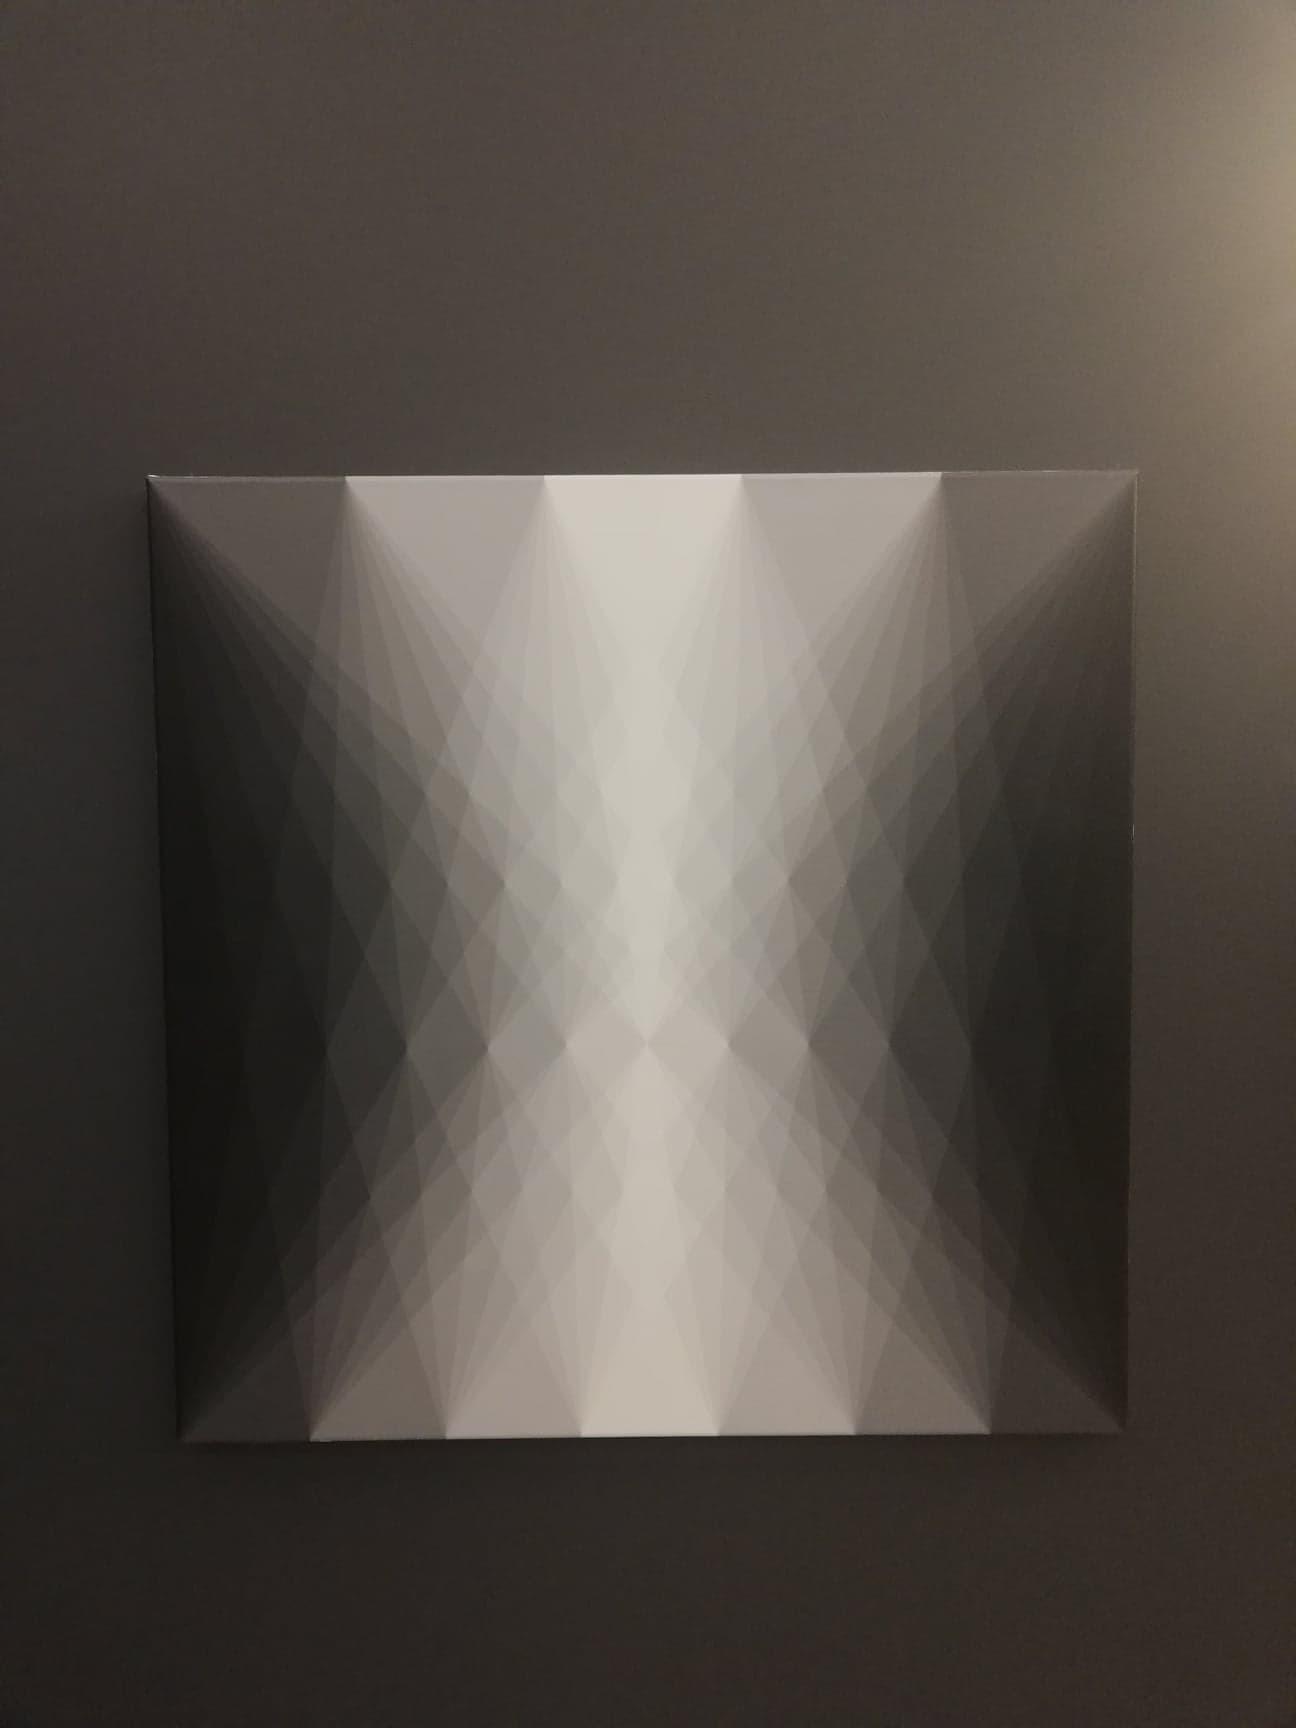 contemporary-art-museum-d606ccbbad5d03a6